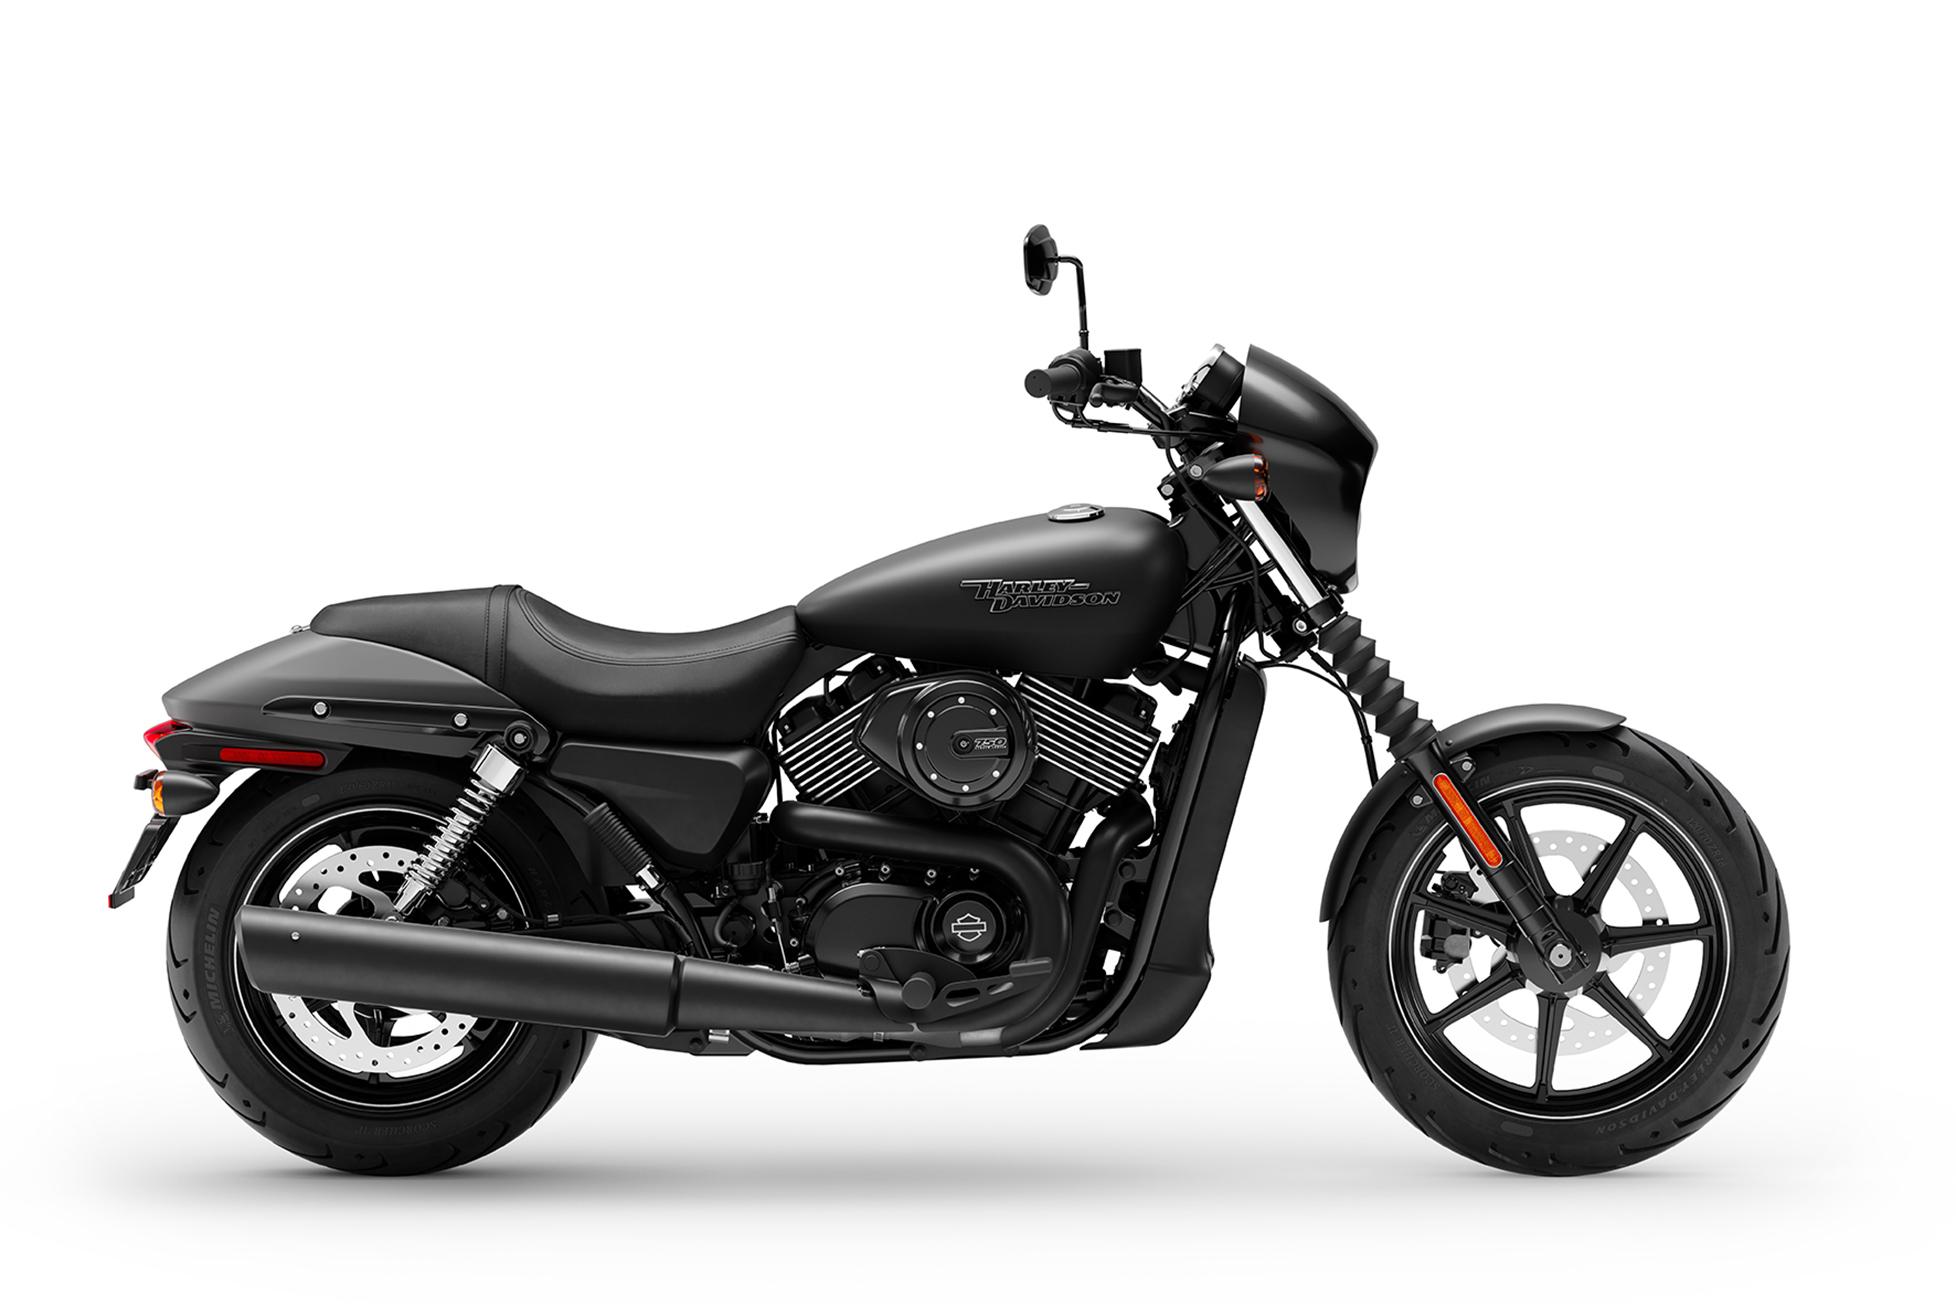 2019 motorcycle lineup harley davidson usa2019 harley davidson street 750 motorcycle